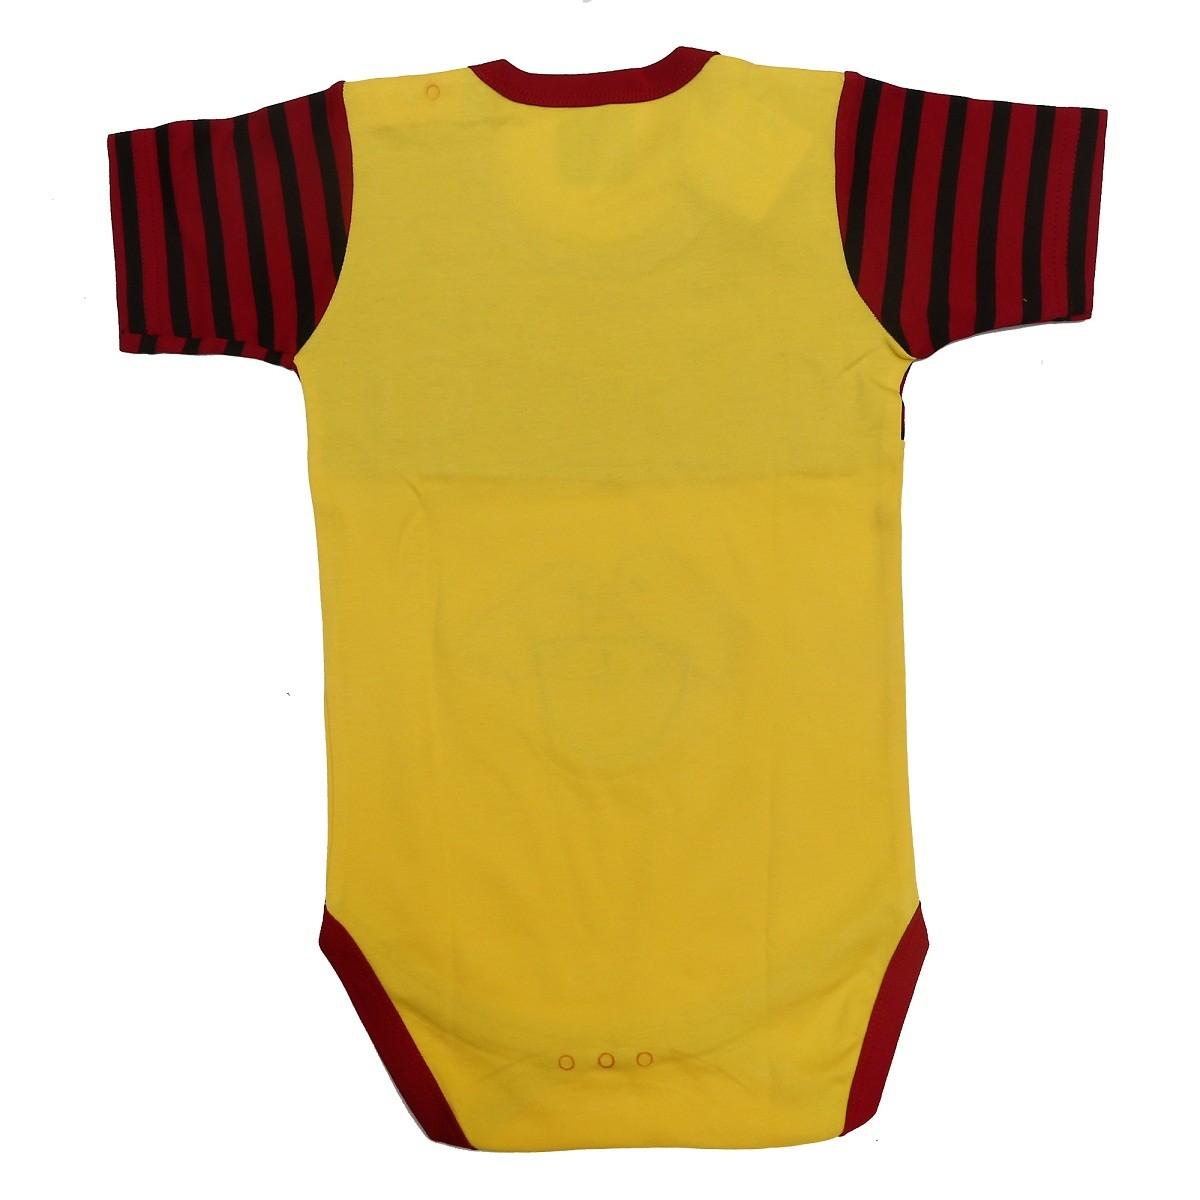 1c3a32f683d9 Kaboos Designing Baby Romper